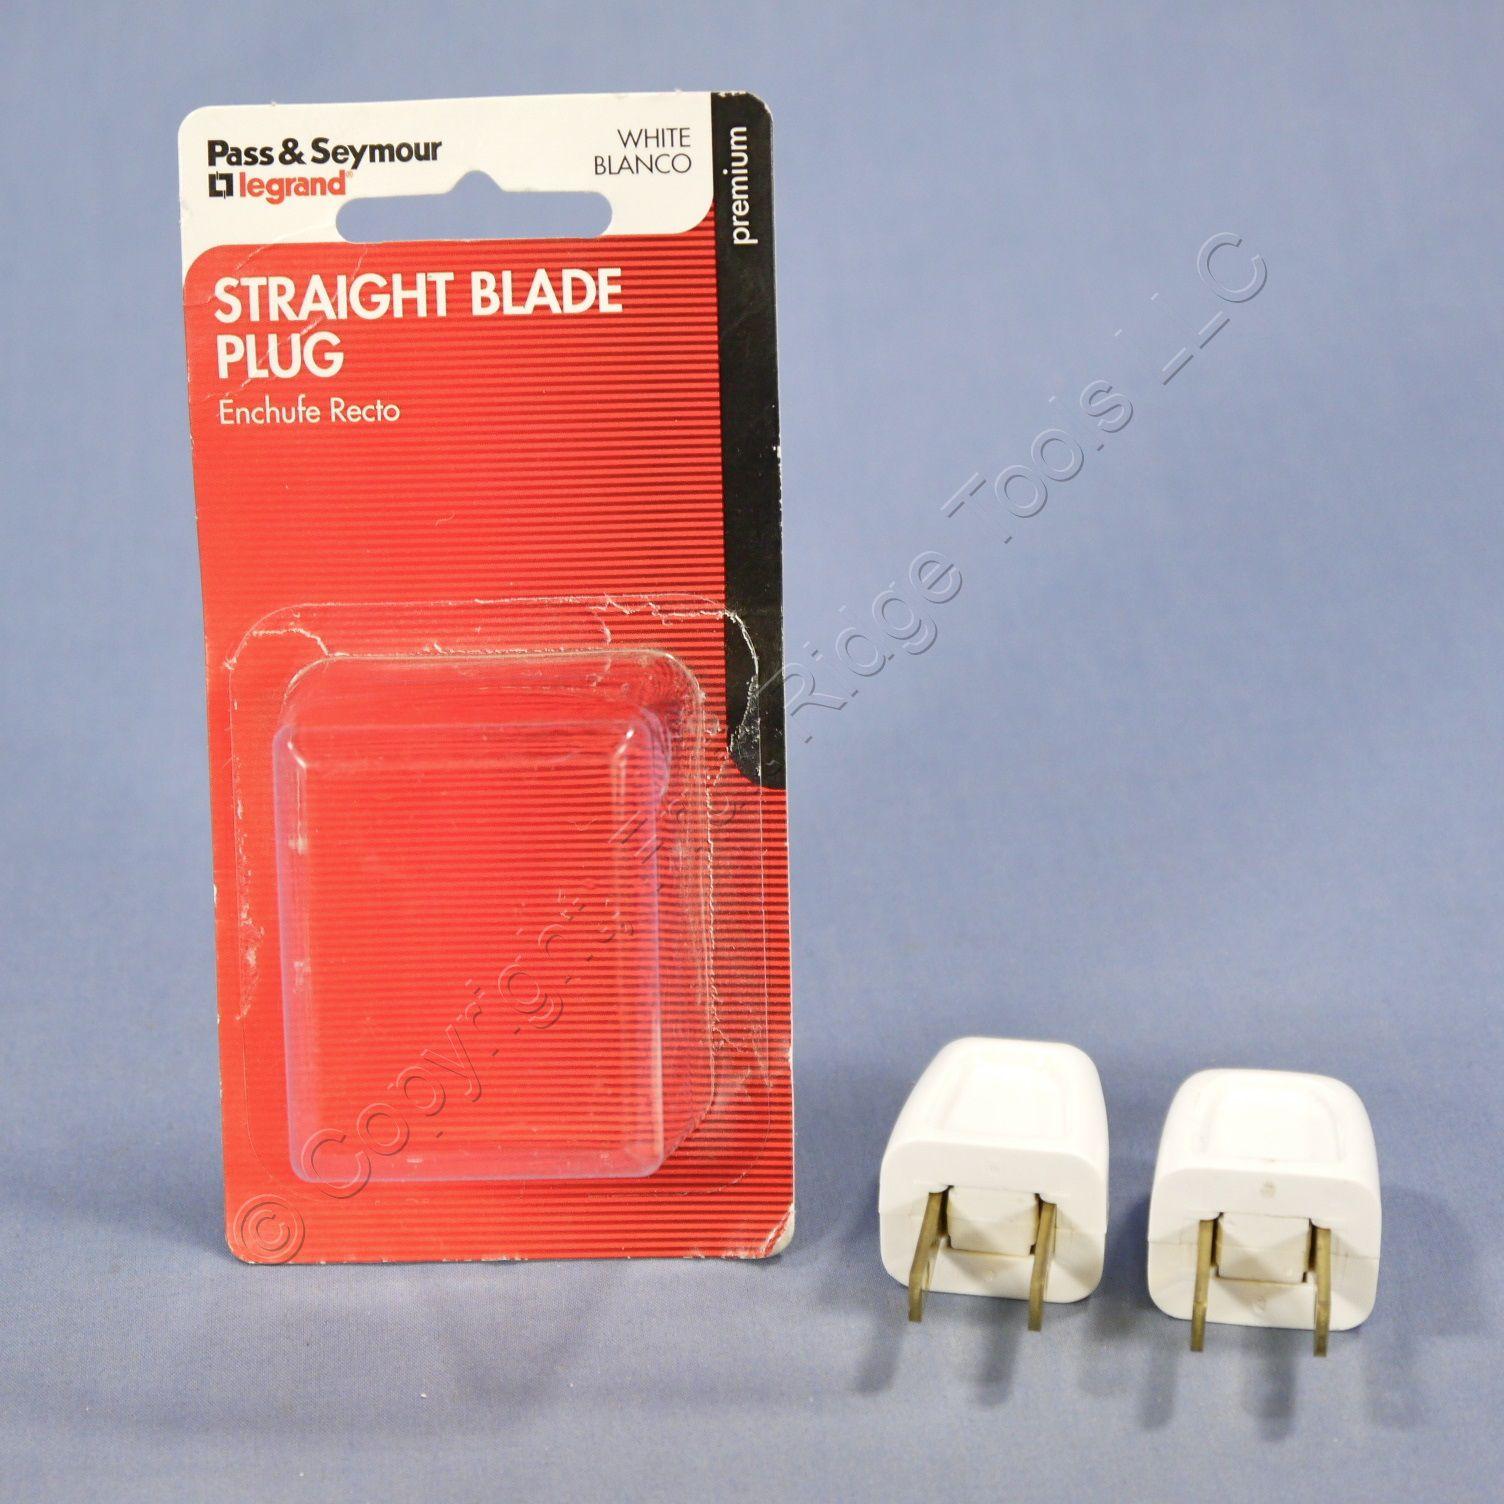 2 Pass and Seymour White Easy Install Plugs 10A 125V Non-Polarized 18-2 SPT-1 1-15P 2611-W